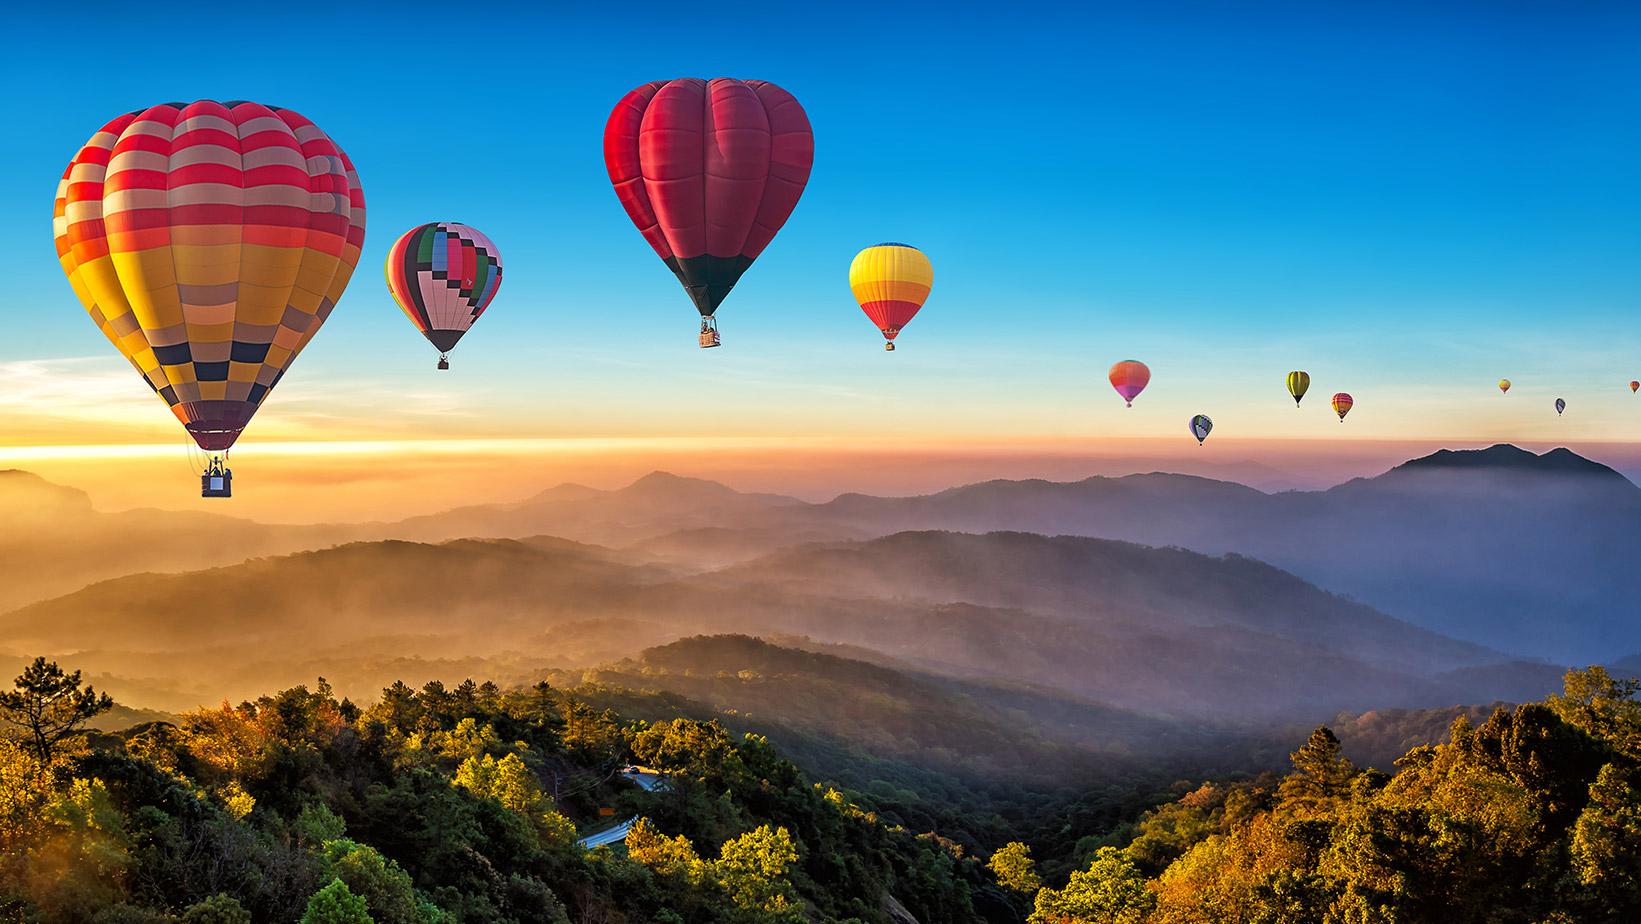 Balloons flying over a mountain range